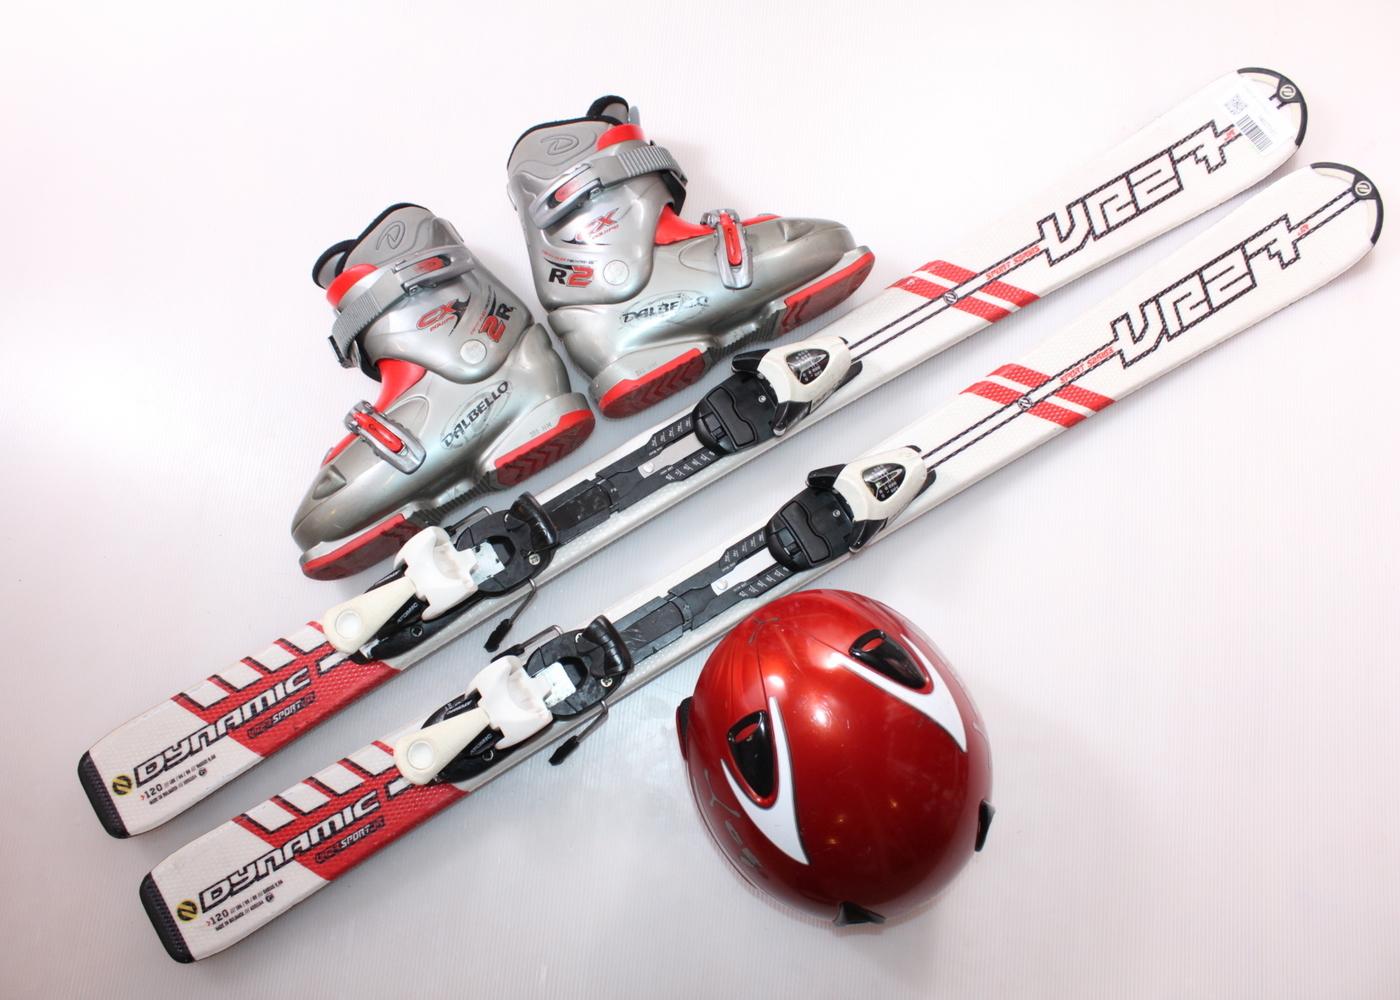 Dětské lyže DYNASTAR VR 27 120 cm + lyžáky  36EU + helma